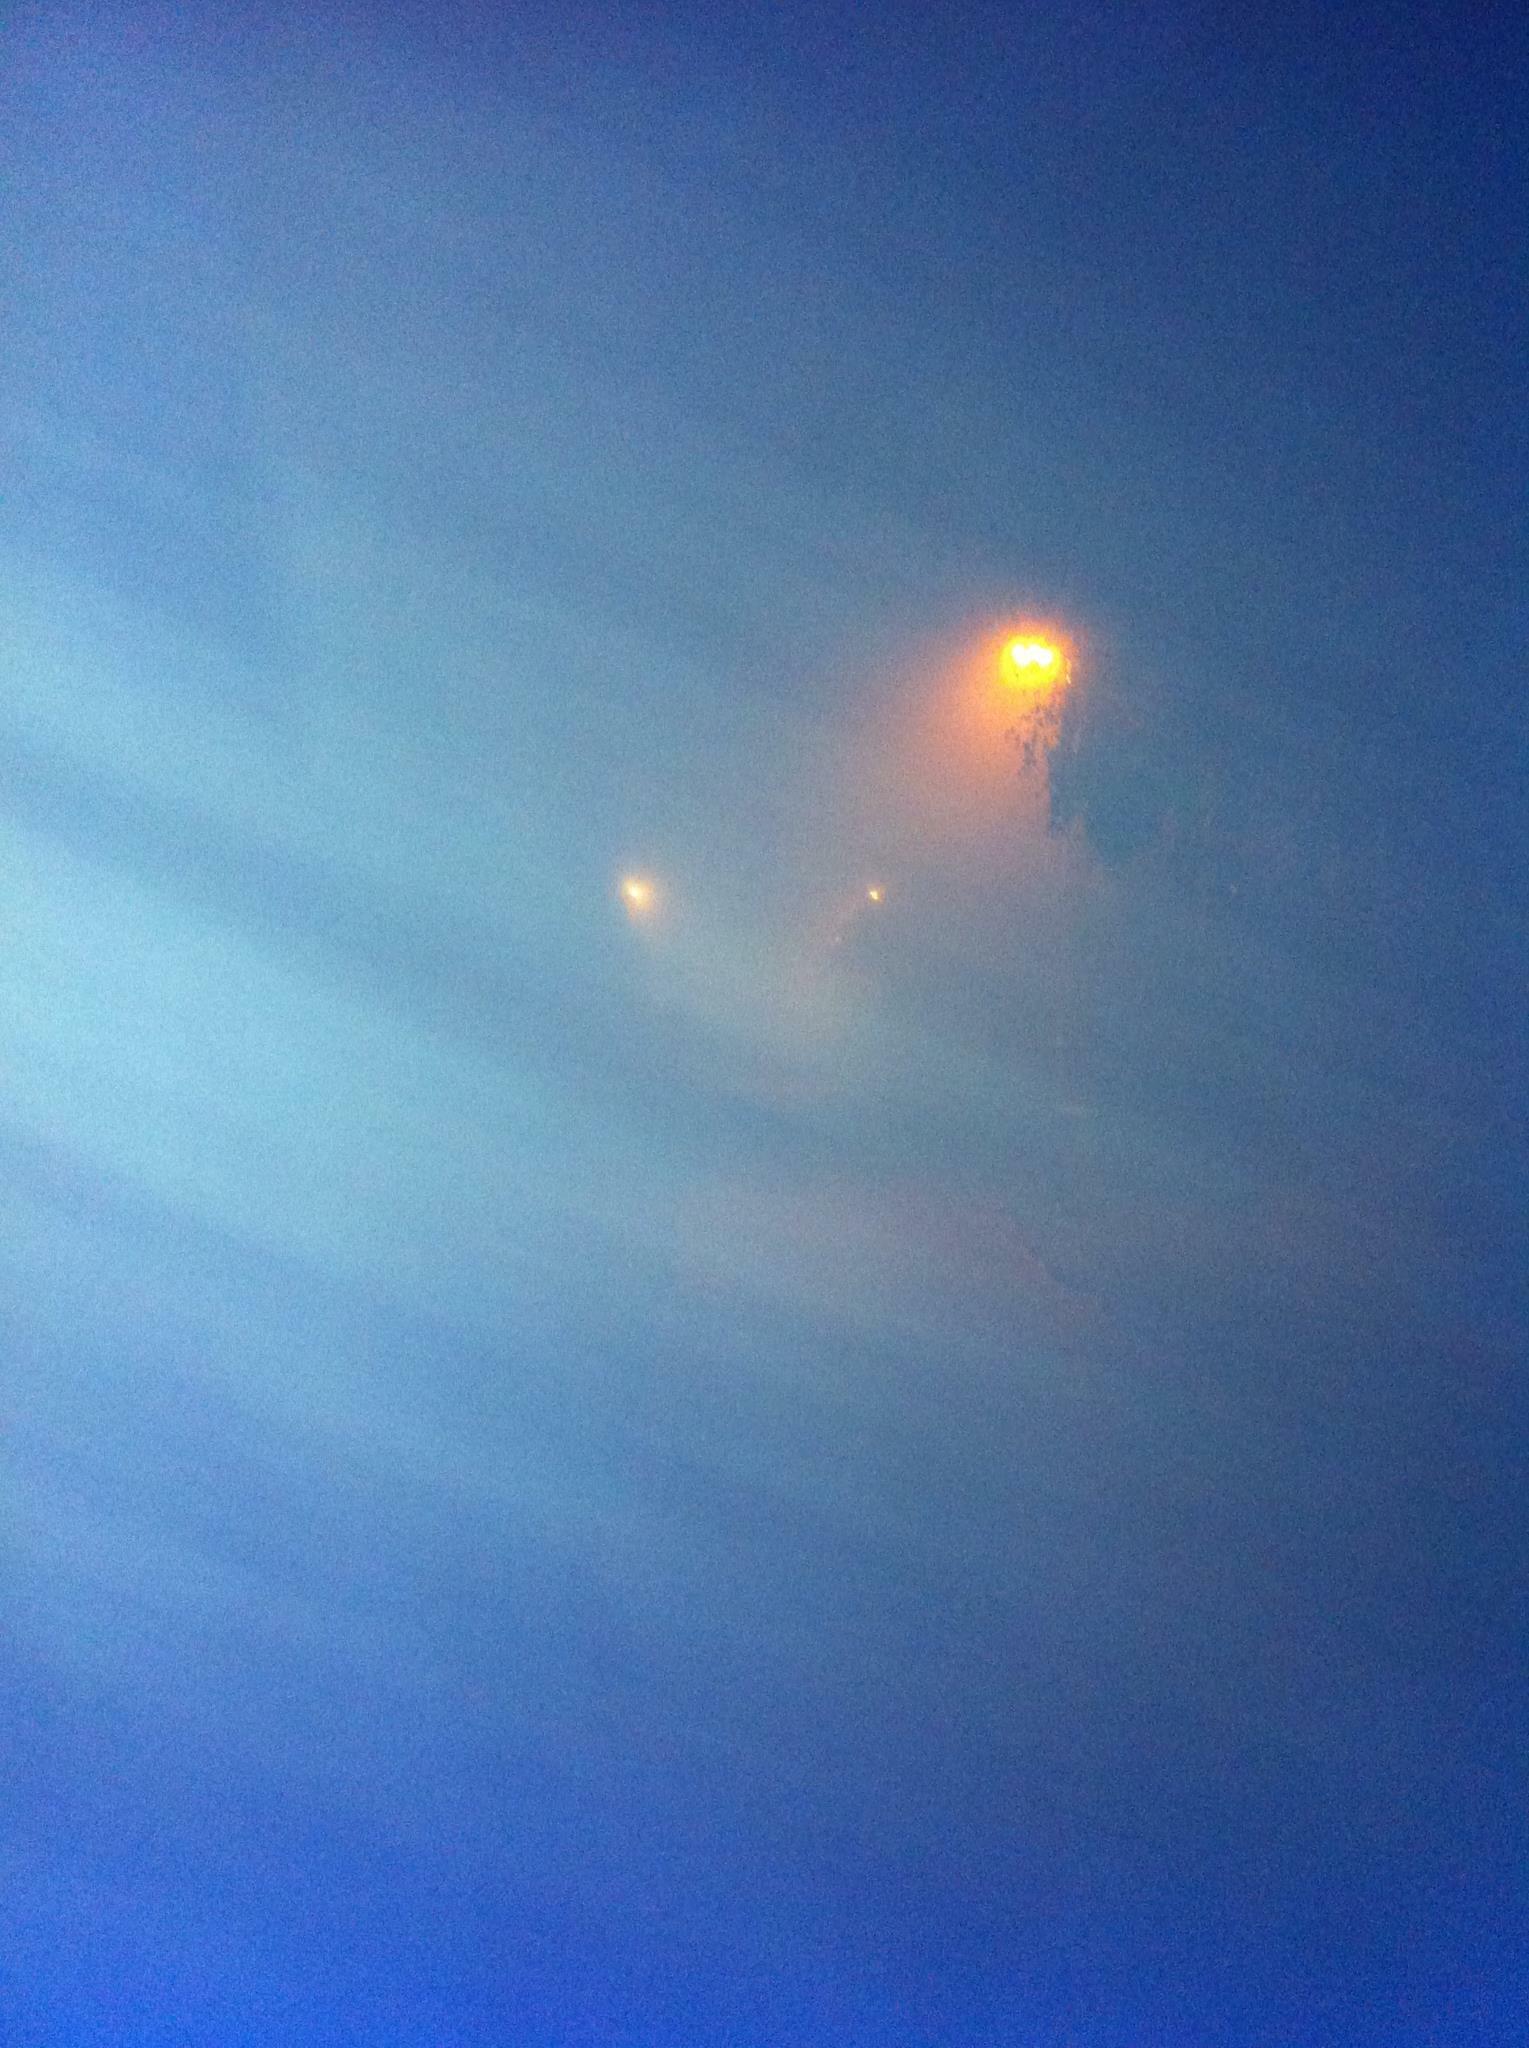 Mist in the evening by Daniel Svensson